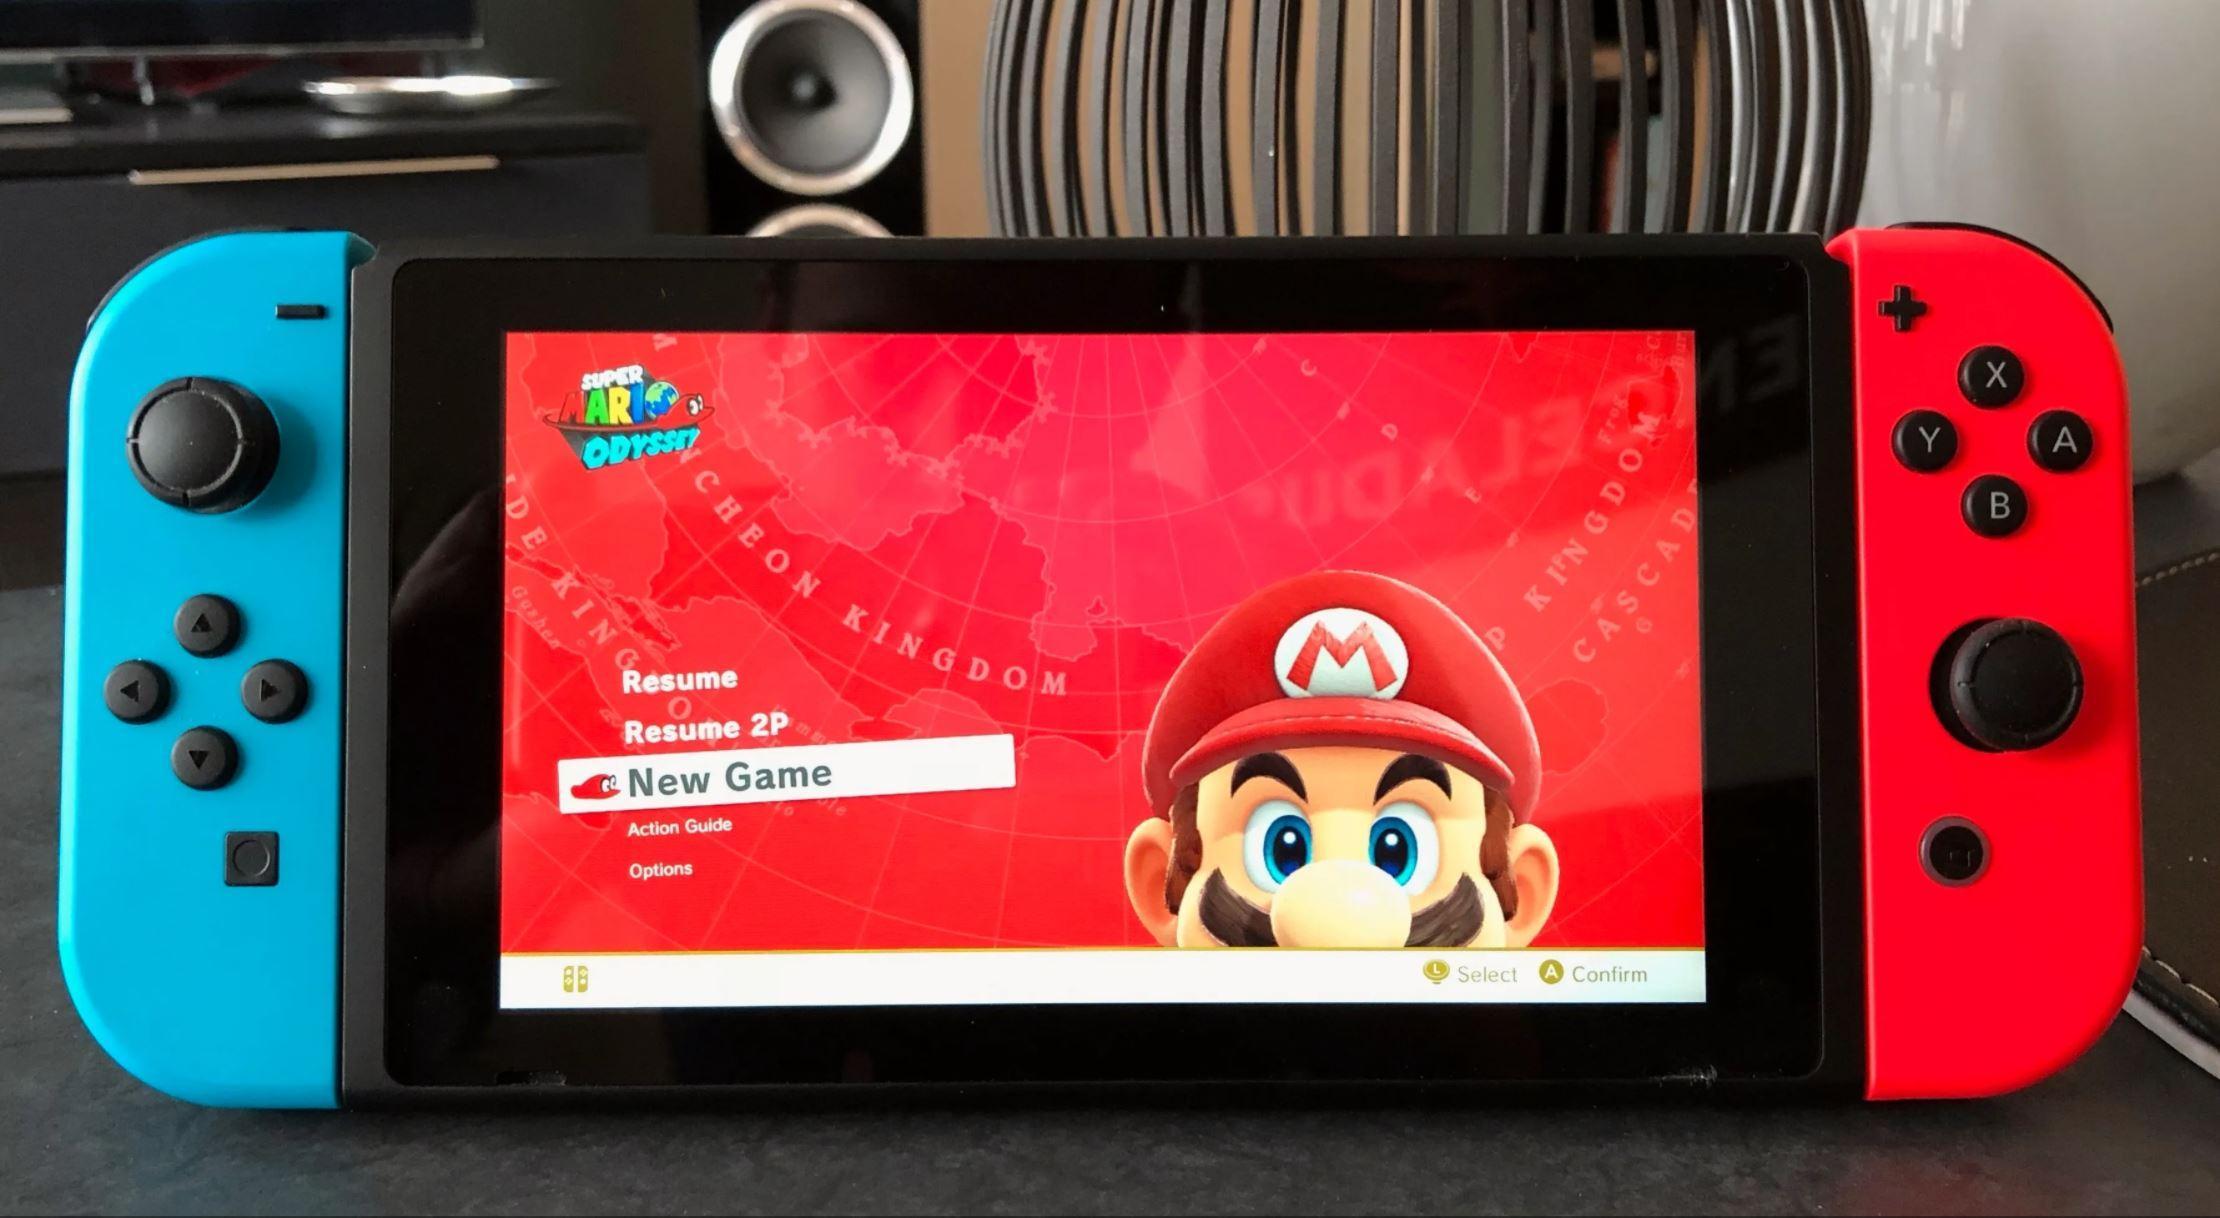 Nye Nintendo Switch kan være i salg 4. juni